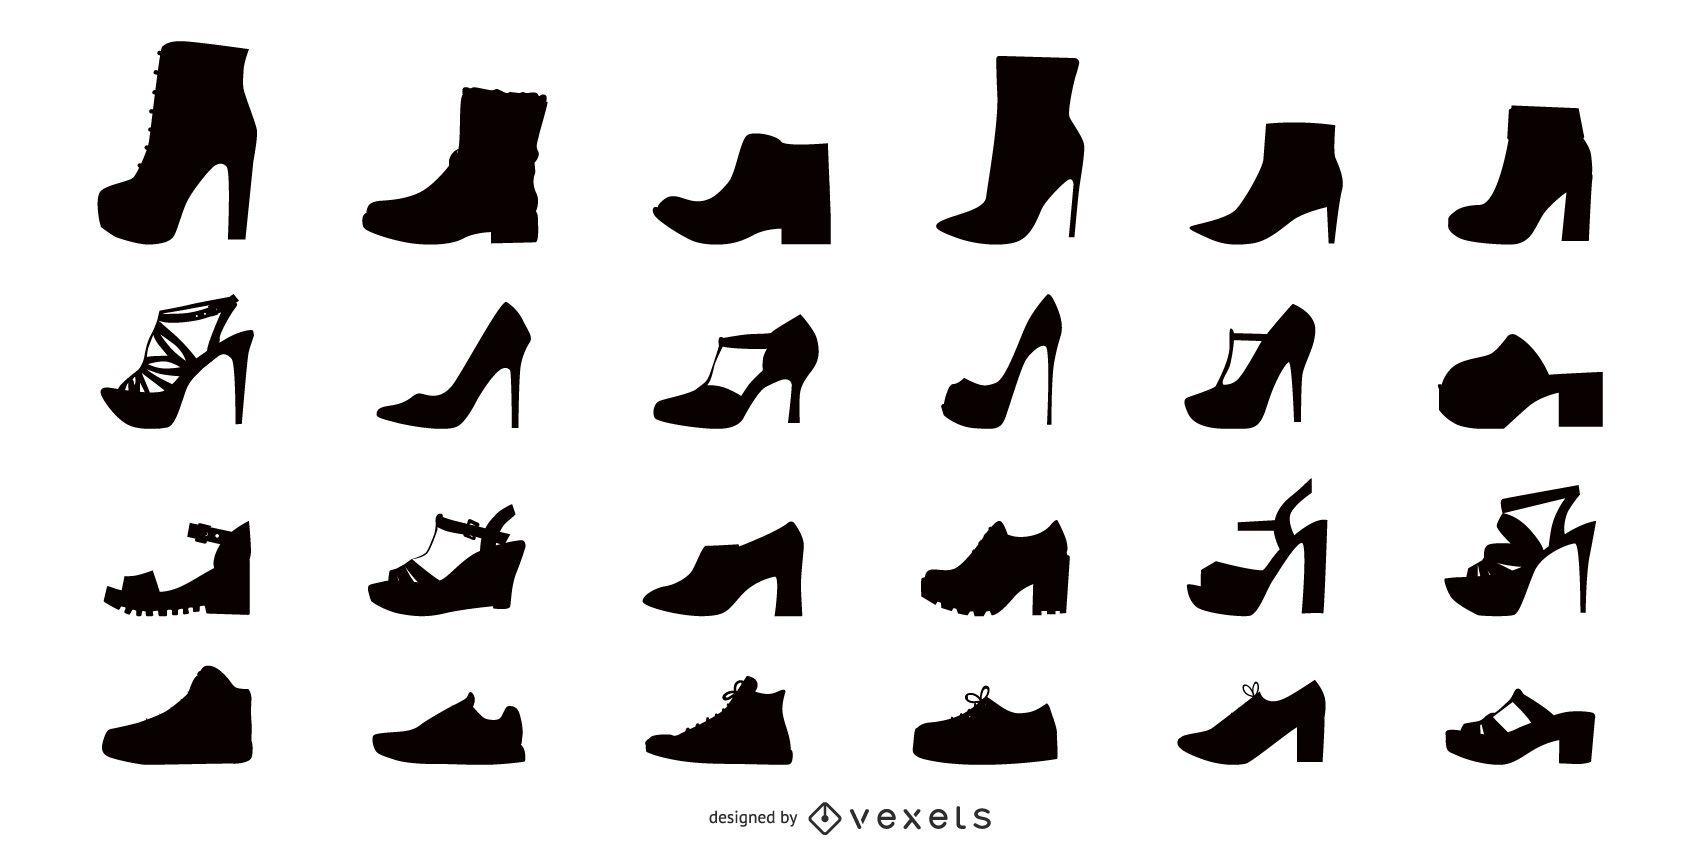 Conjunto de ícones planos de sapatos femininos